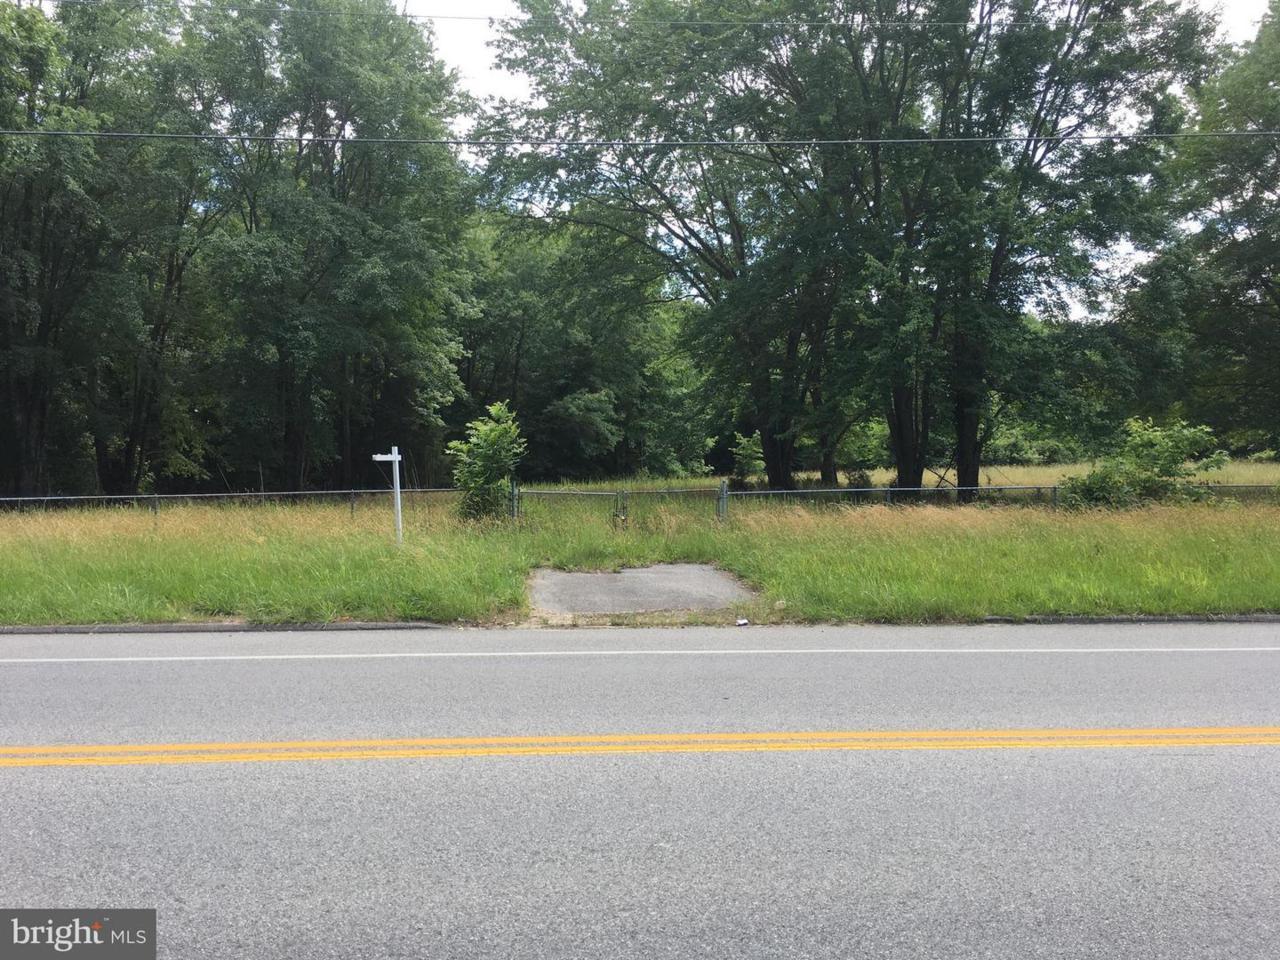 7022786 Hawthorne Road - Photo 1